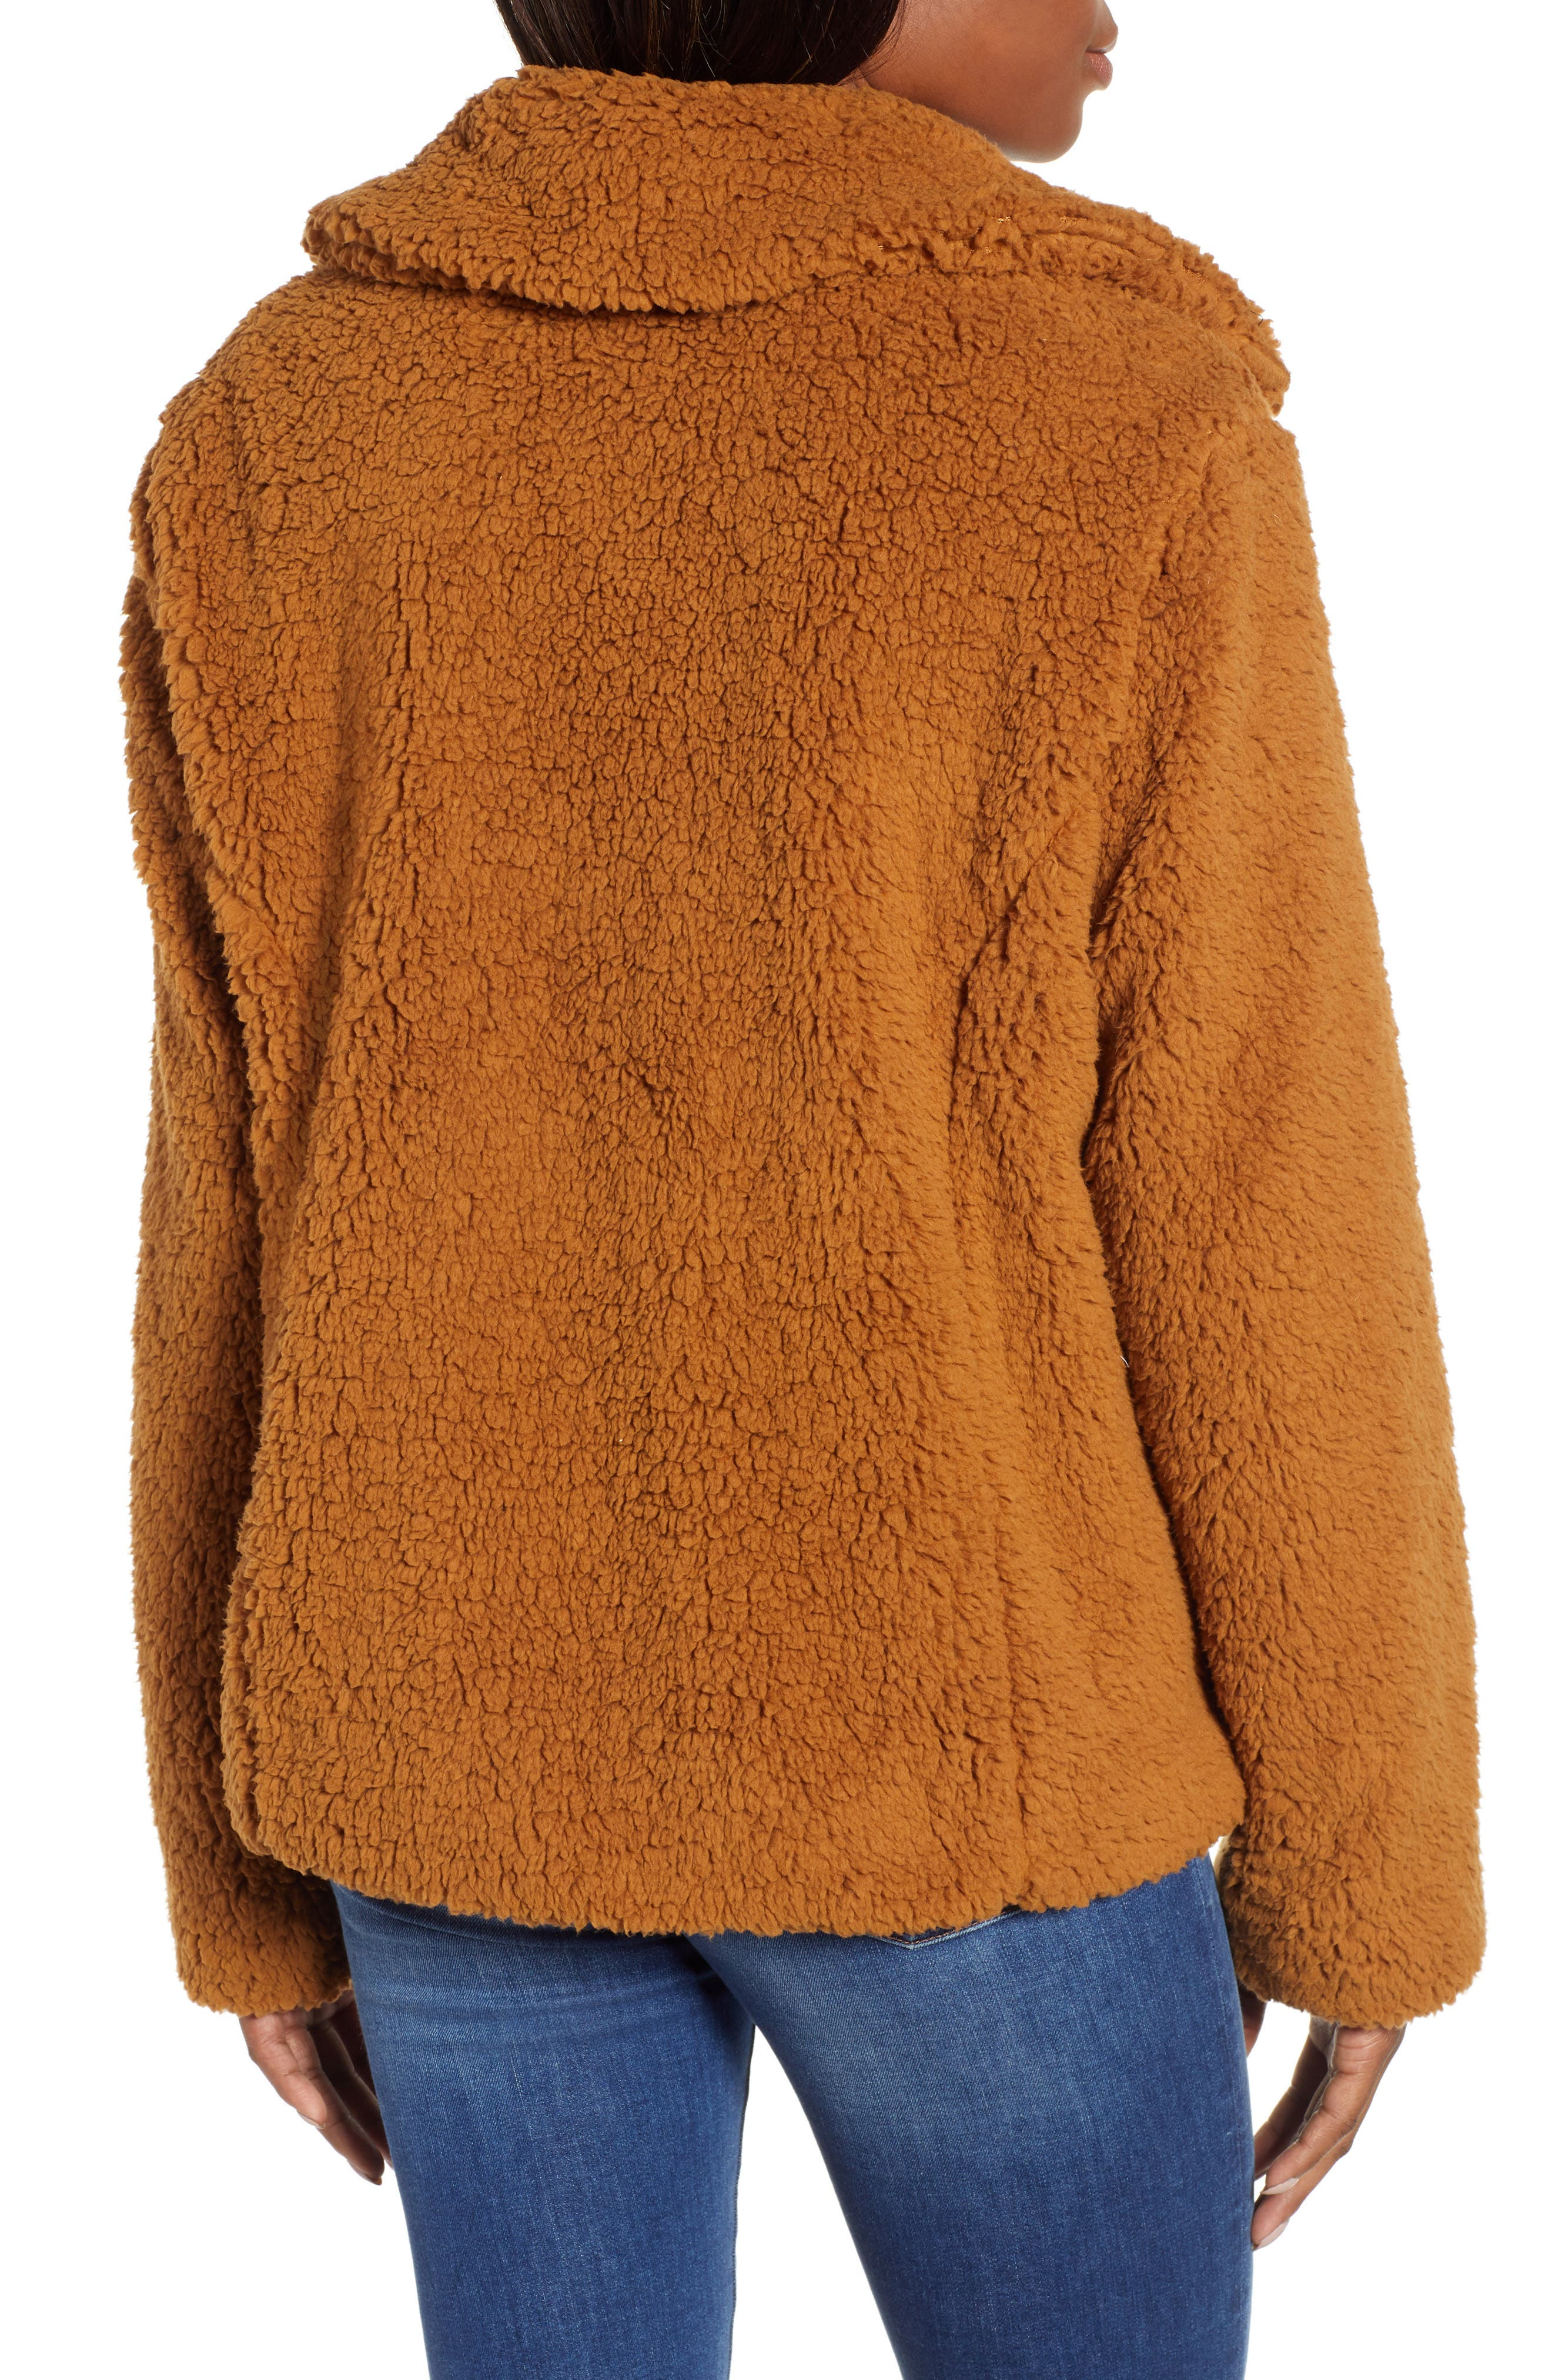 Faux Shearling Jacket,                             Alternate thumbnail 2, color,                             BROWN SADDLE